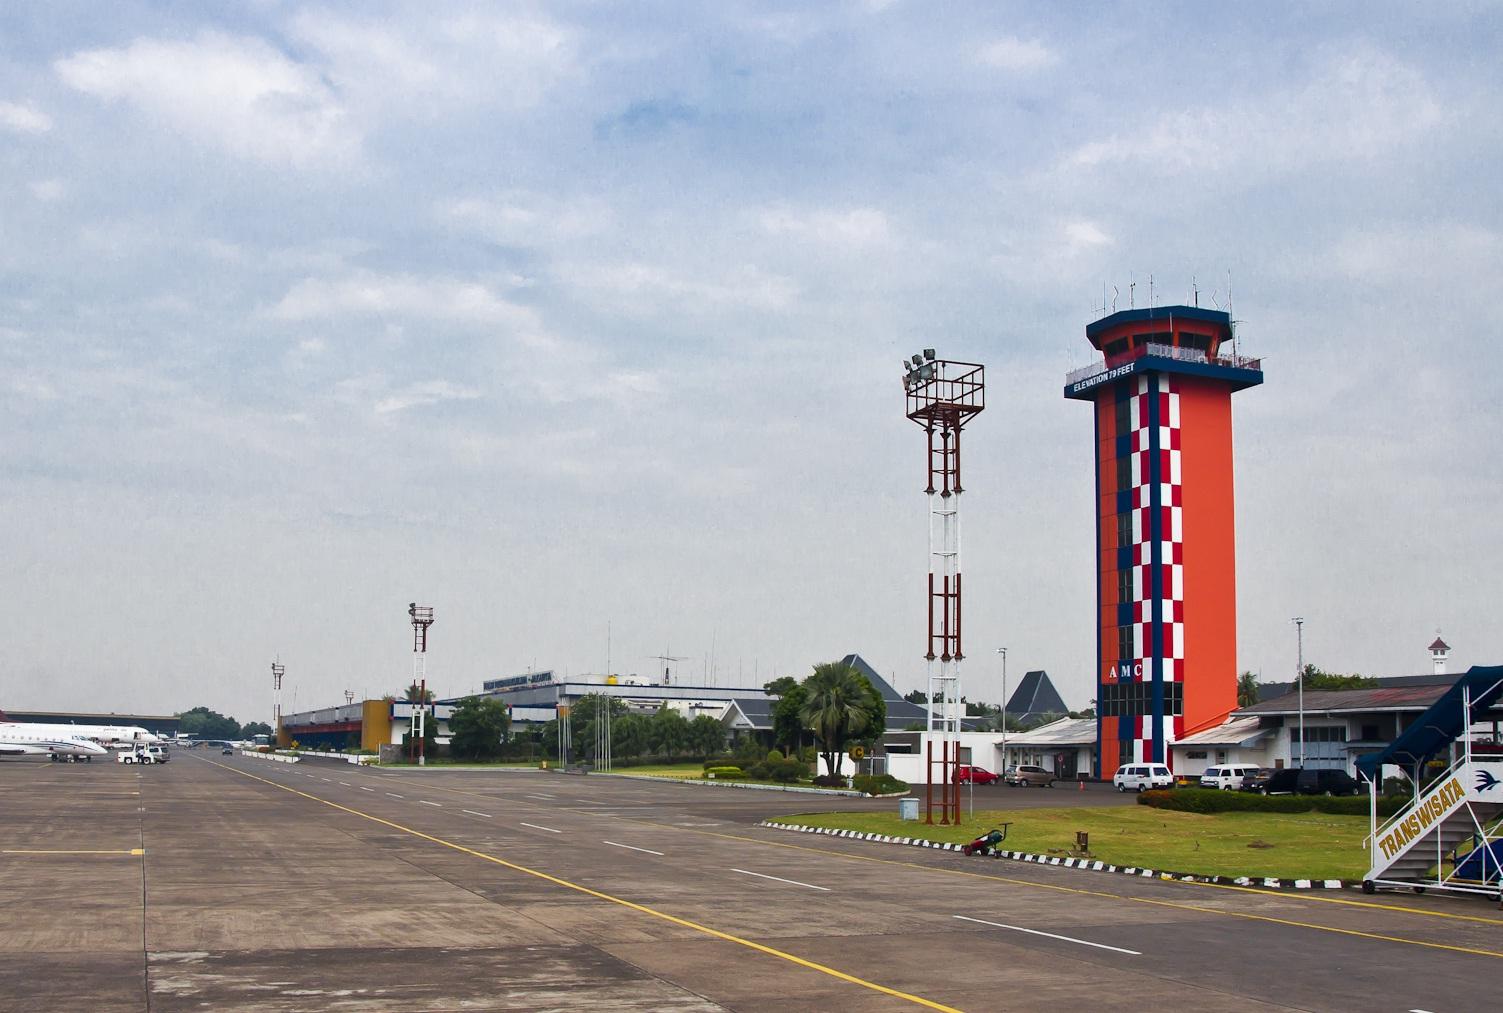 INFO JAKARTA: PELABUHAN UDARA / AIRPORT HALIM PERDANA